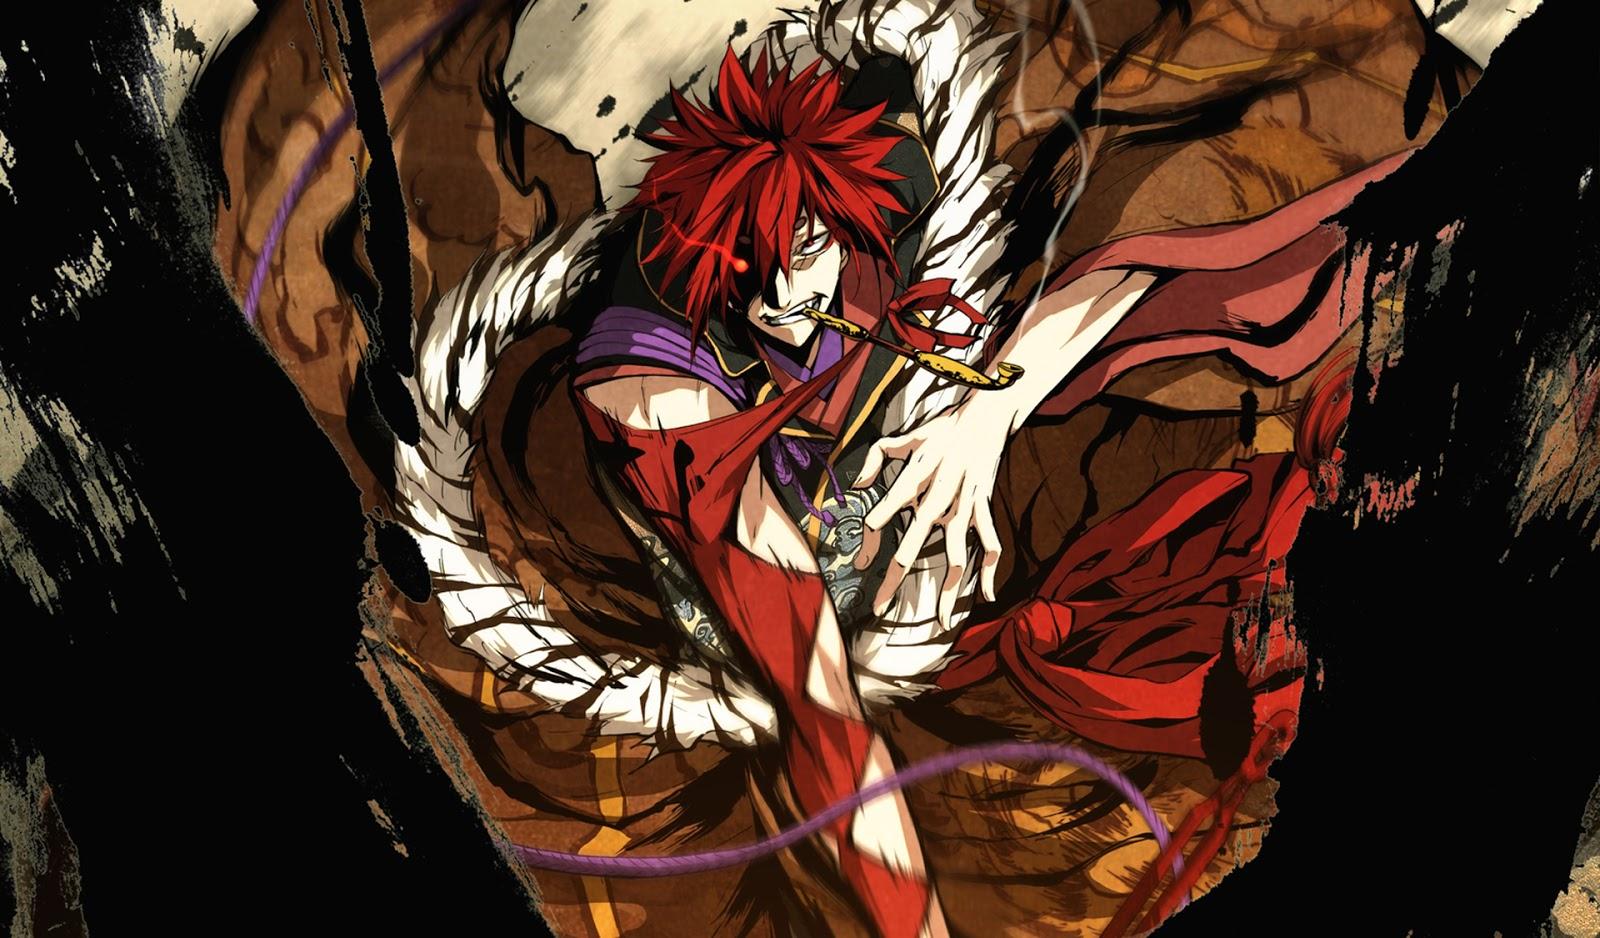 Image habaki sakagami kajiri kamu kagura pipe red anime - Anime male wallpaper hd ...